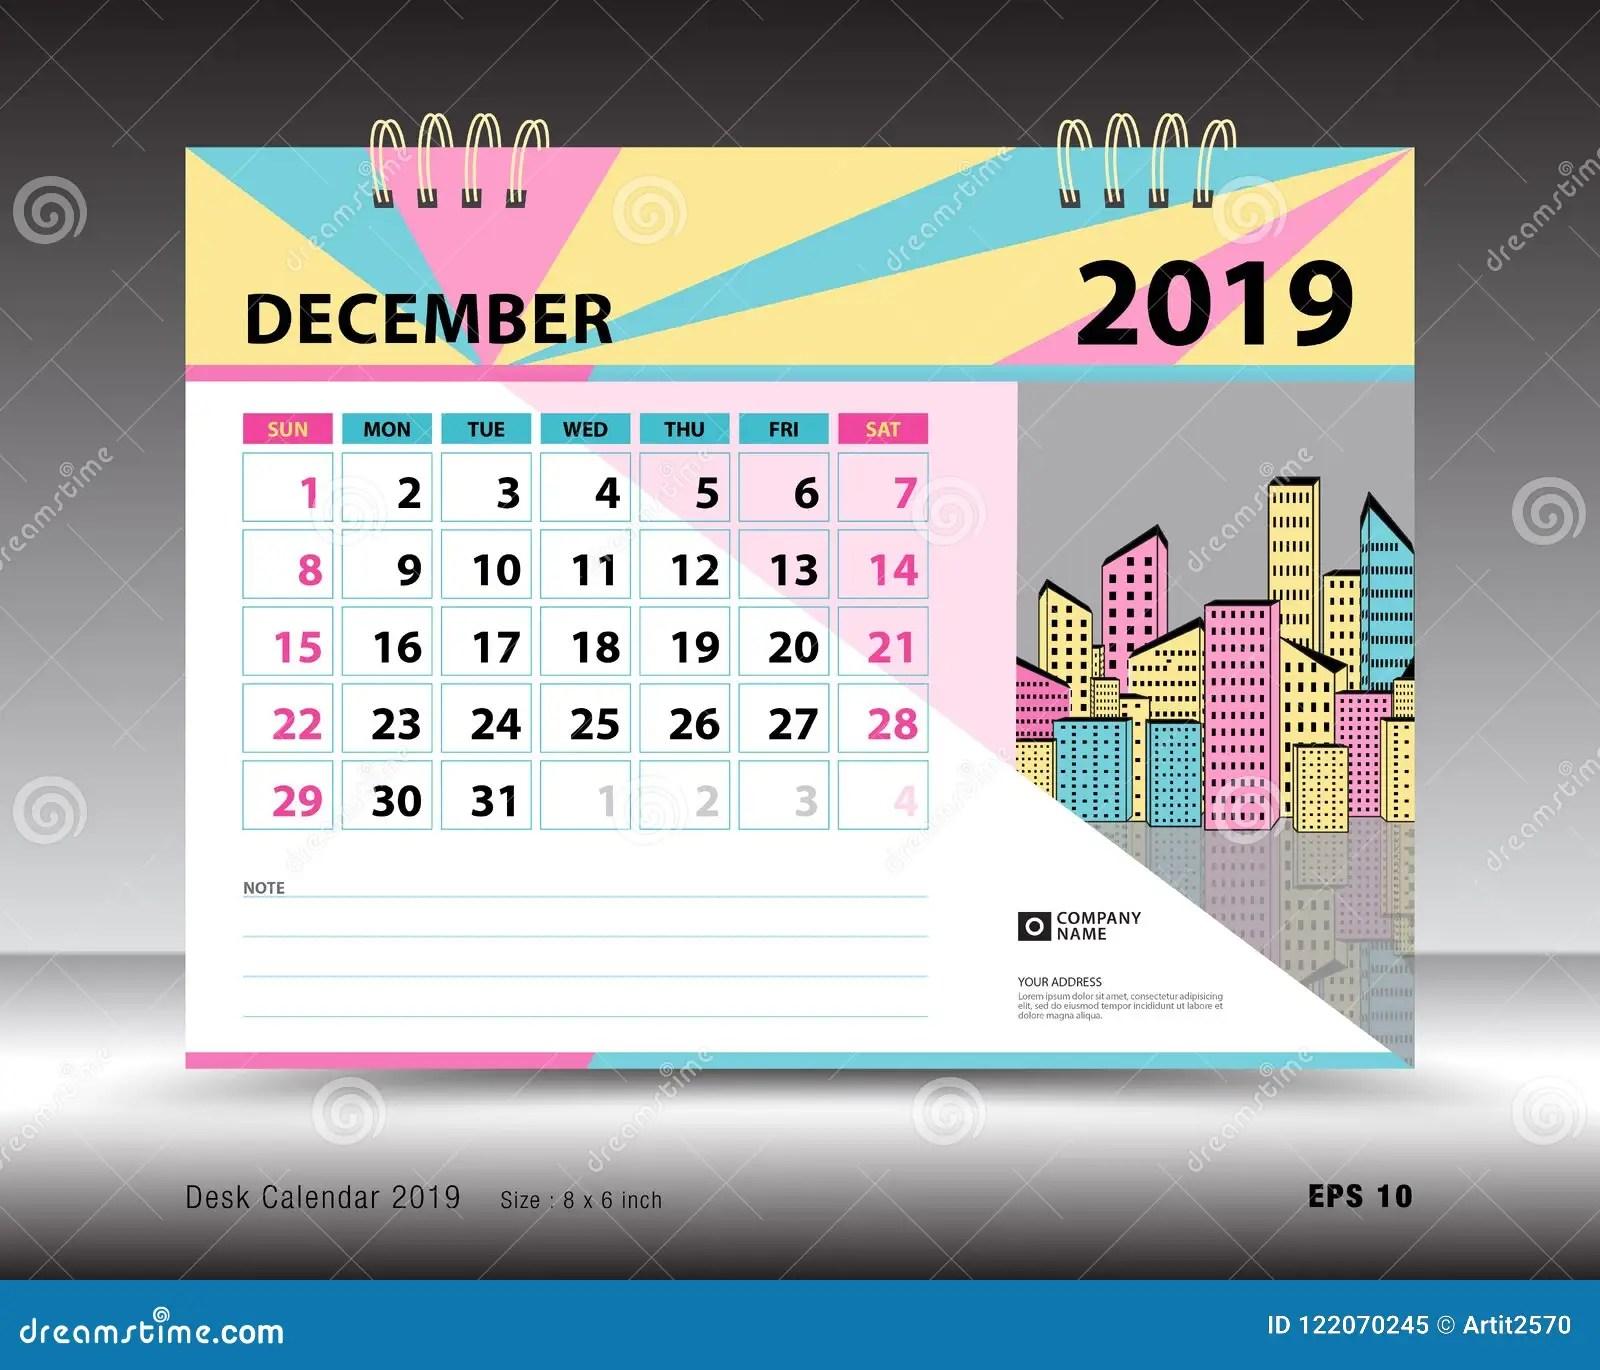 Desk Calendar For DECEMBER 2019 Template Printable Calendar Planner Design Template Stock